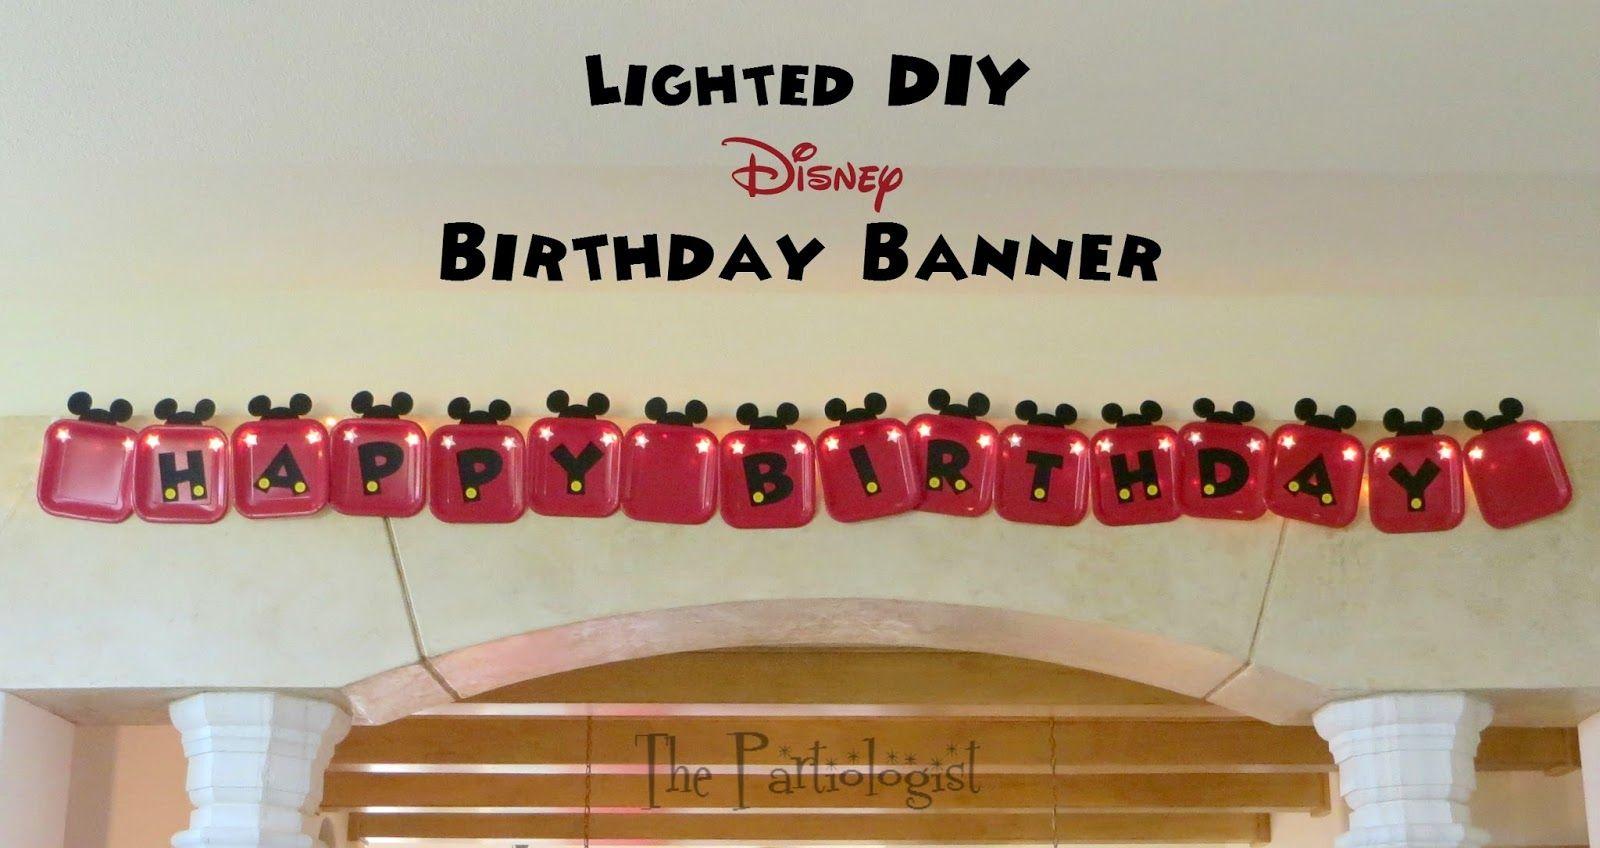 The Partiologist: DIY Disney Banner!